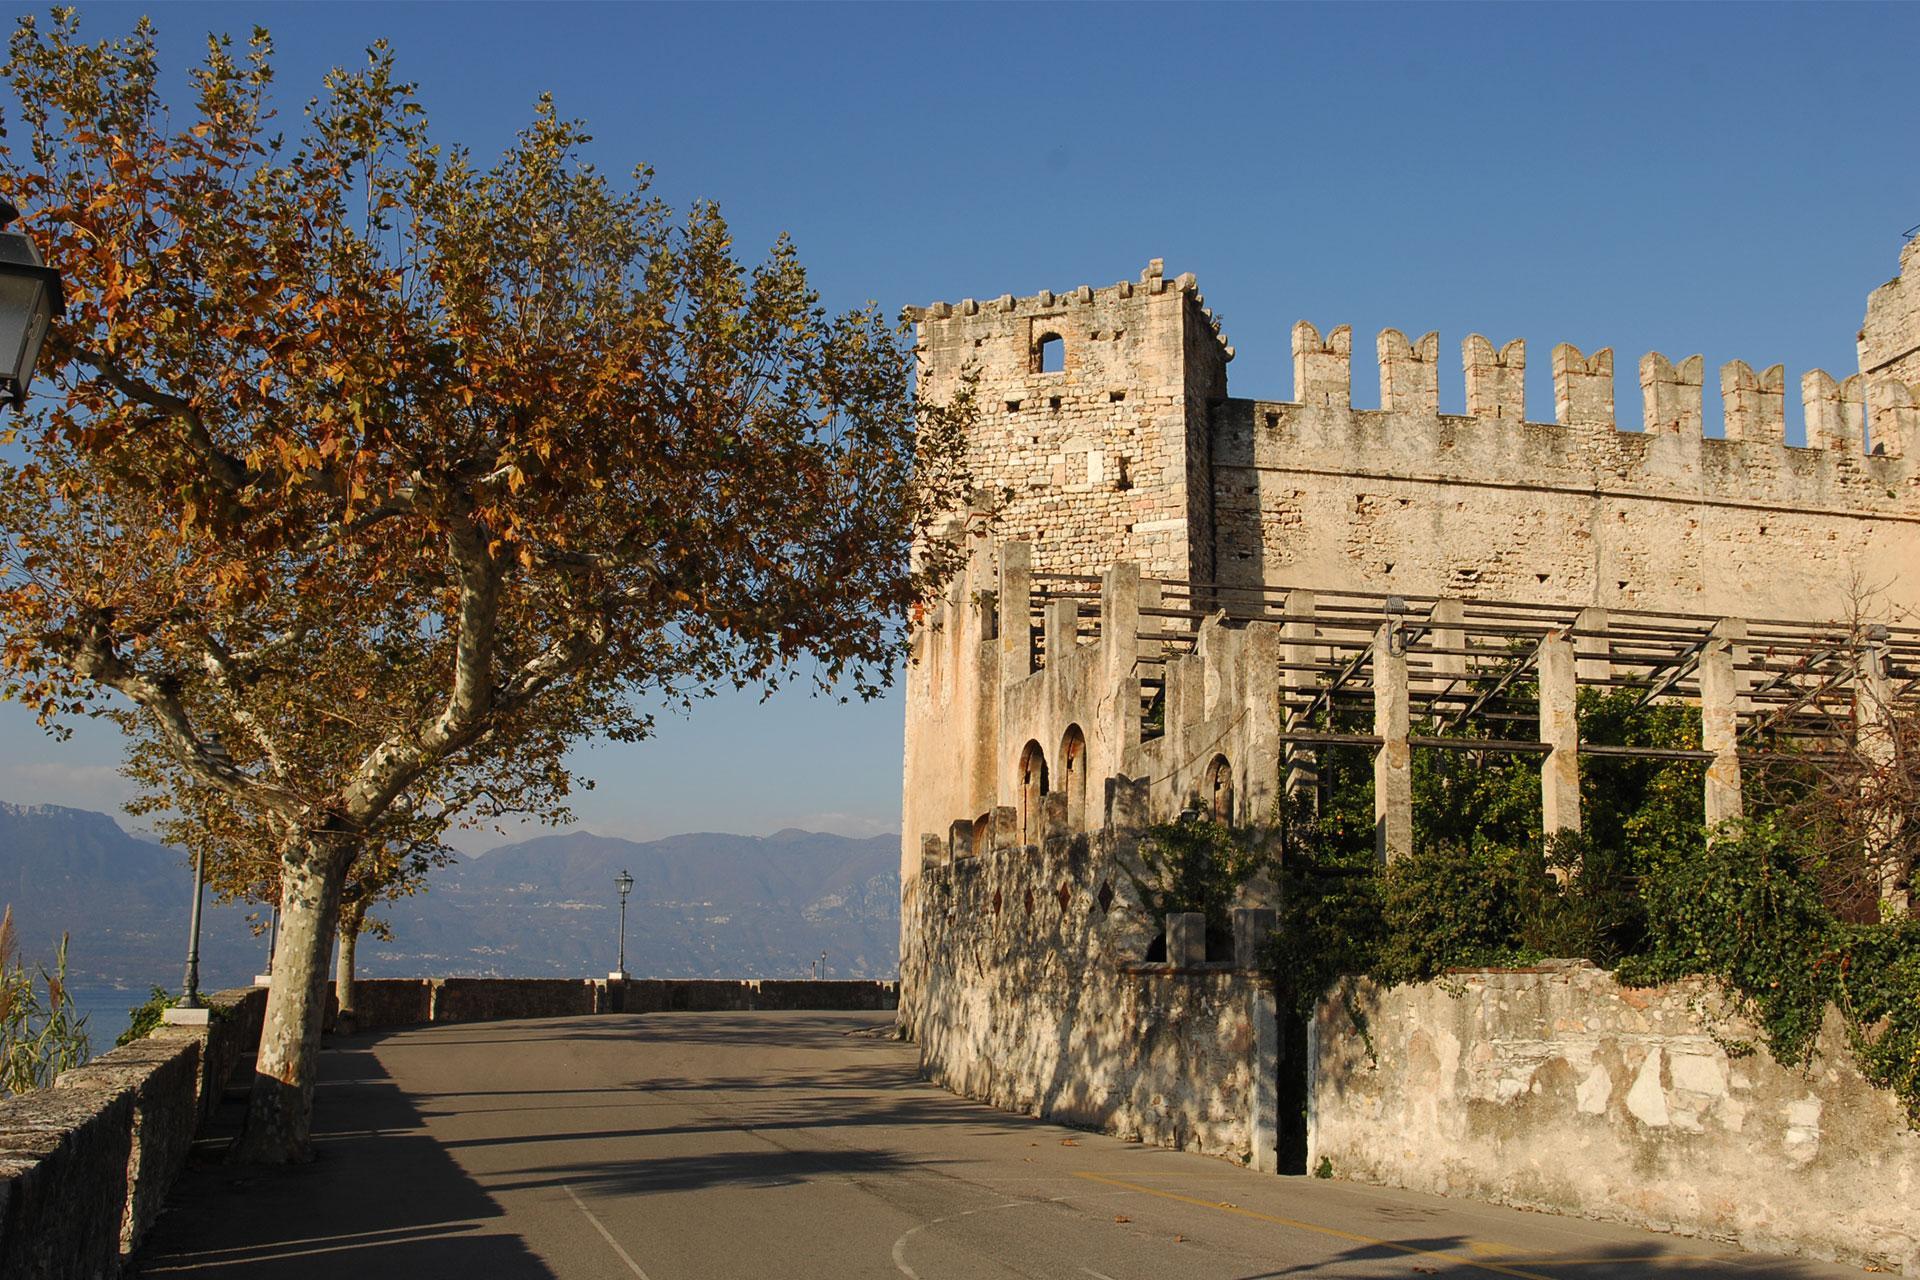 Castello_TorriBenaco.jpg